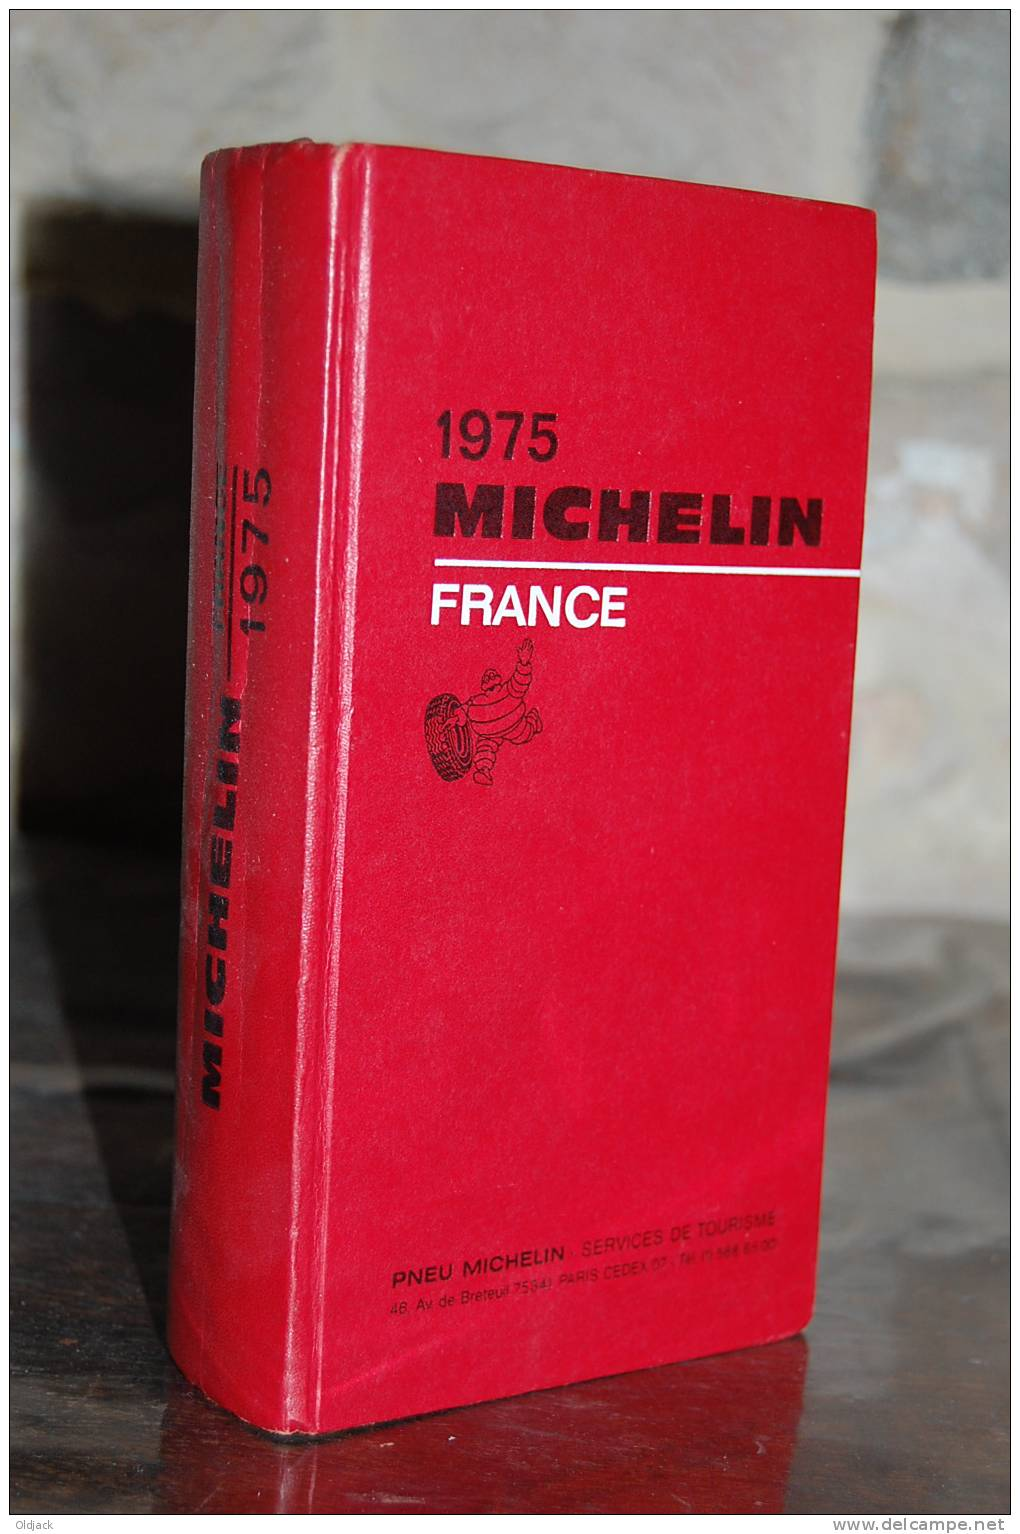 GUIDE MICHELIN France 1975 - Michelin (guides)